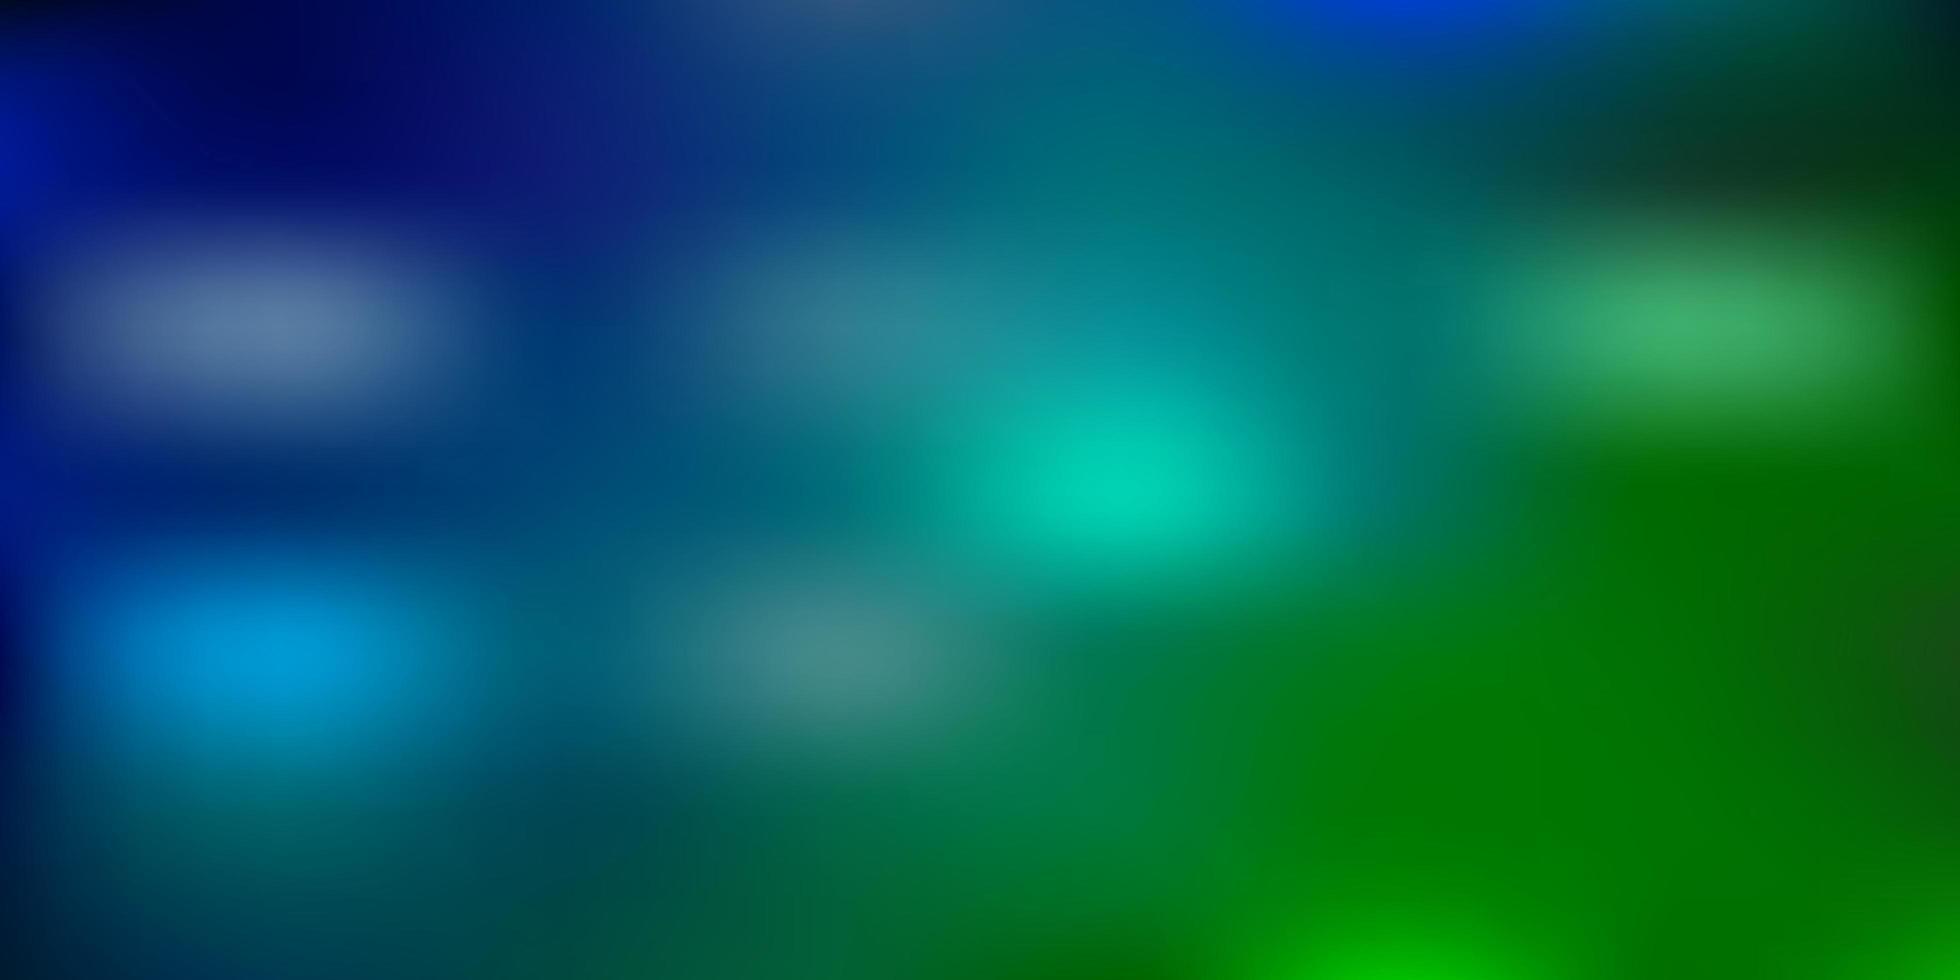 hellblaues, grünes Vektor-verschwommenes Layout. vektor